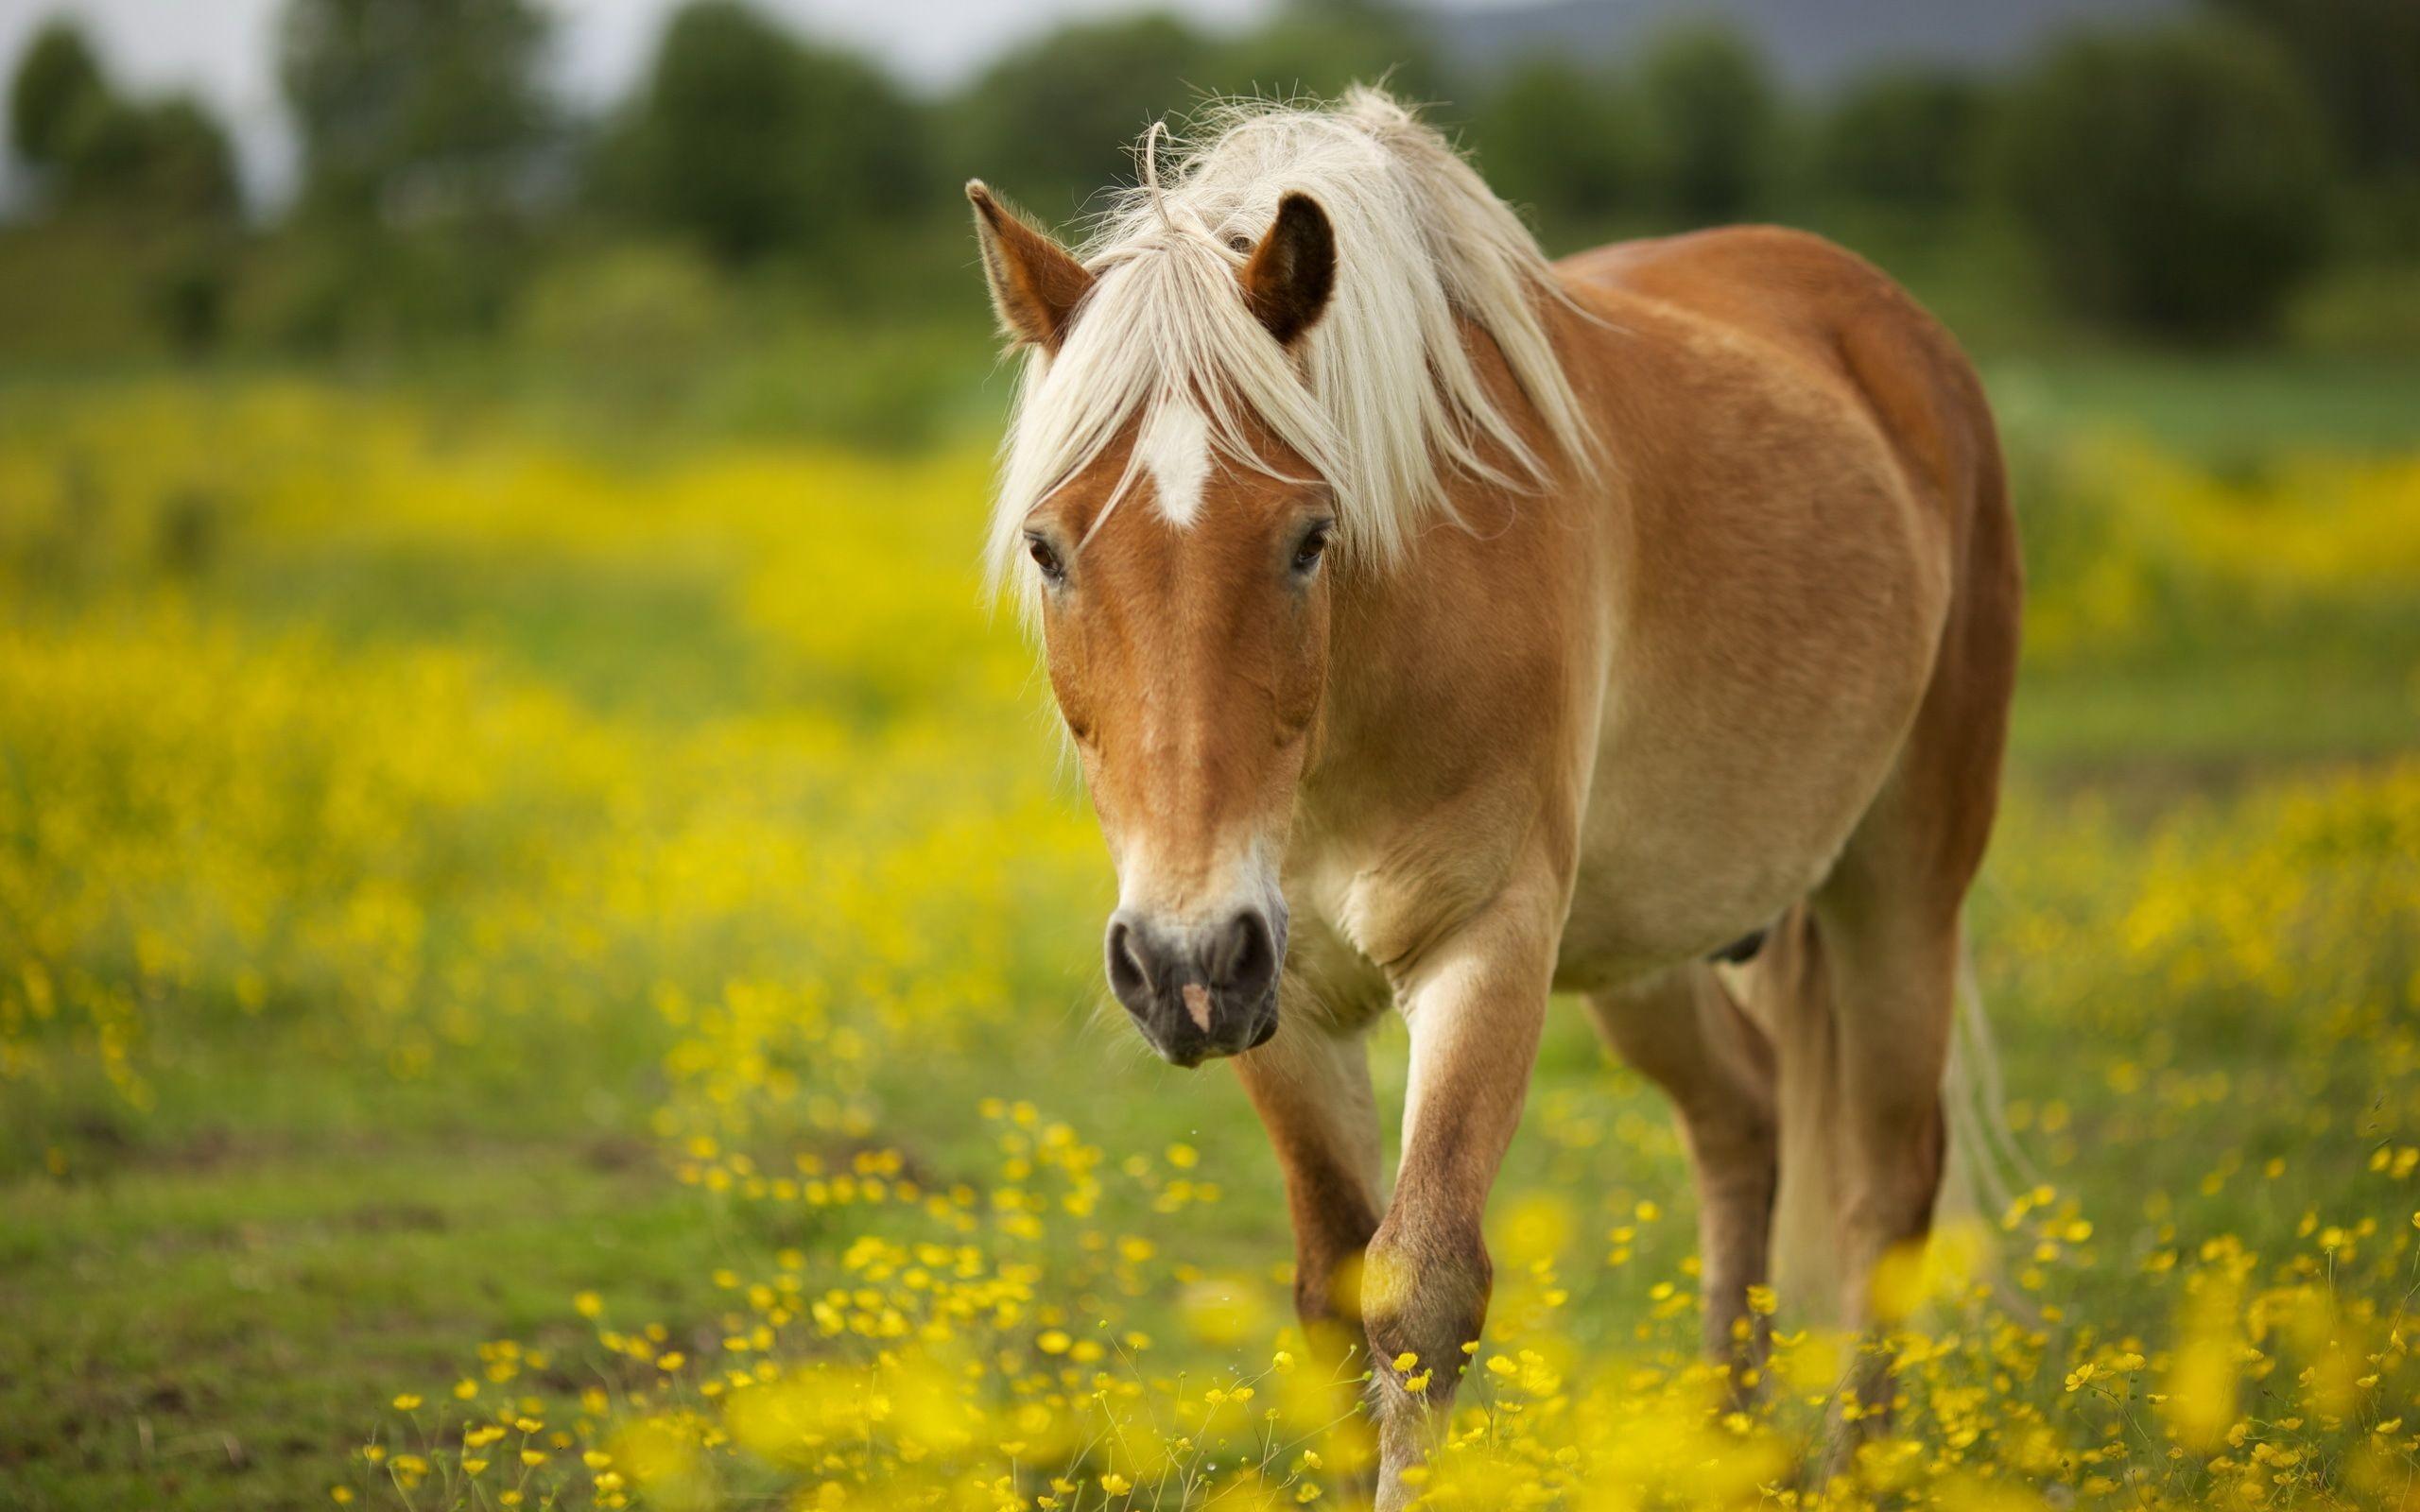 2017-03-15 – horse wallpaper desktop, #1418204 | ololoshka | Pinterest | Horse  wallpaper, Hd widescreen wallpapers and Widescreen wallpaper